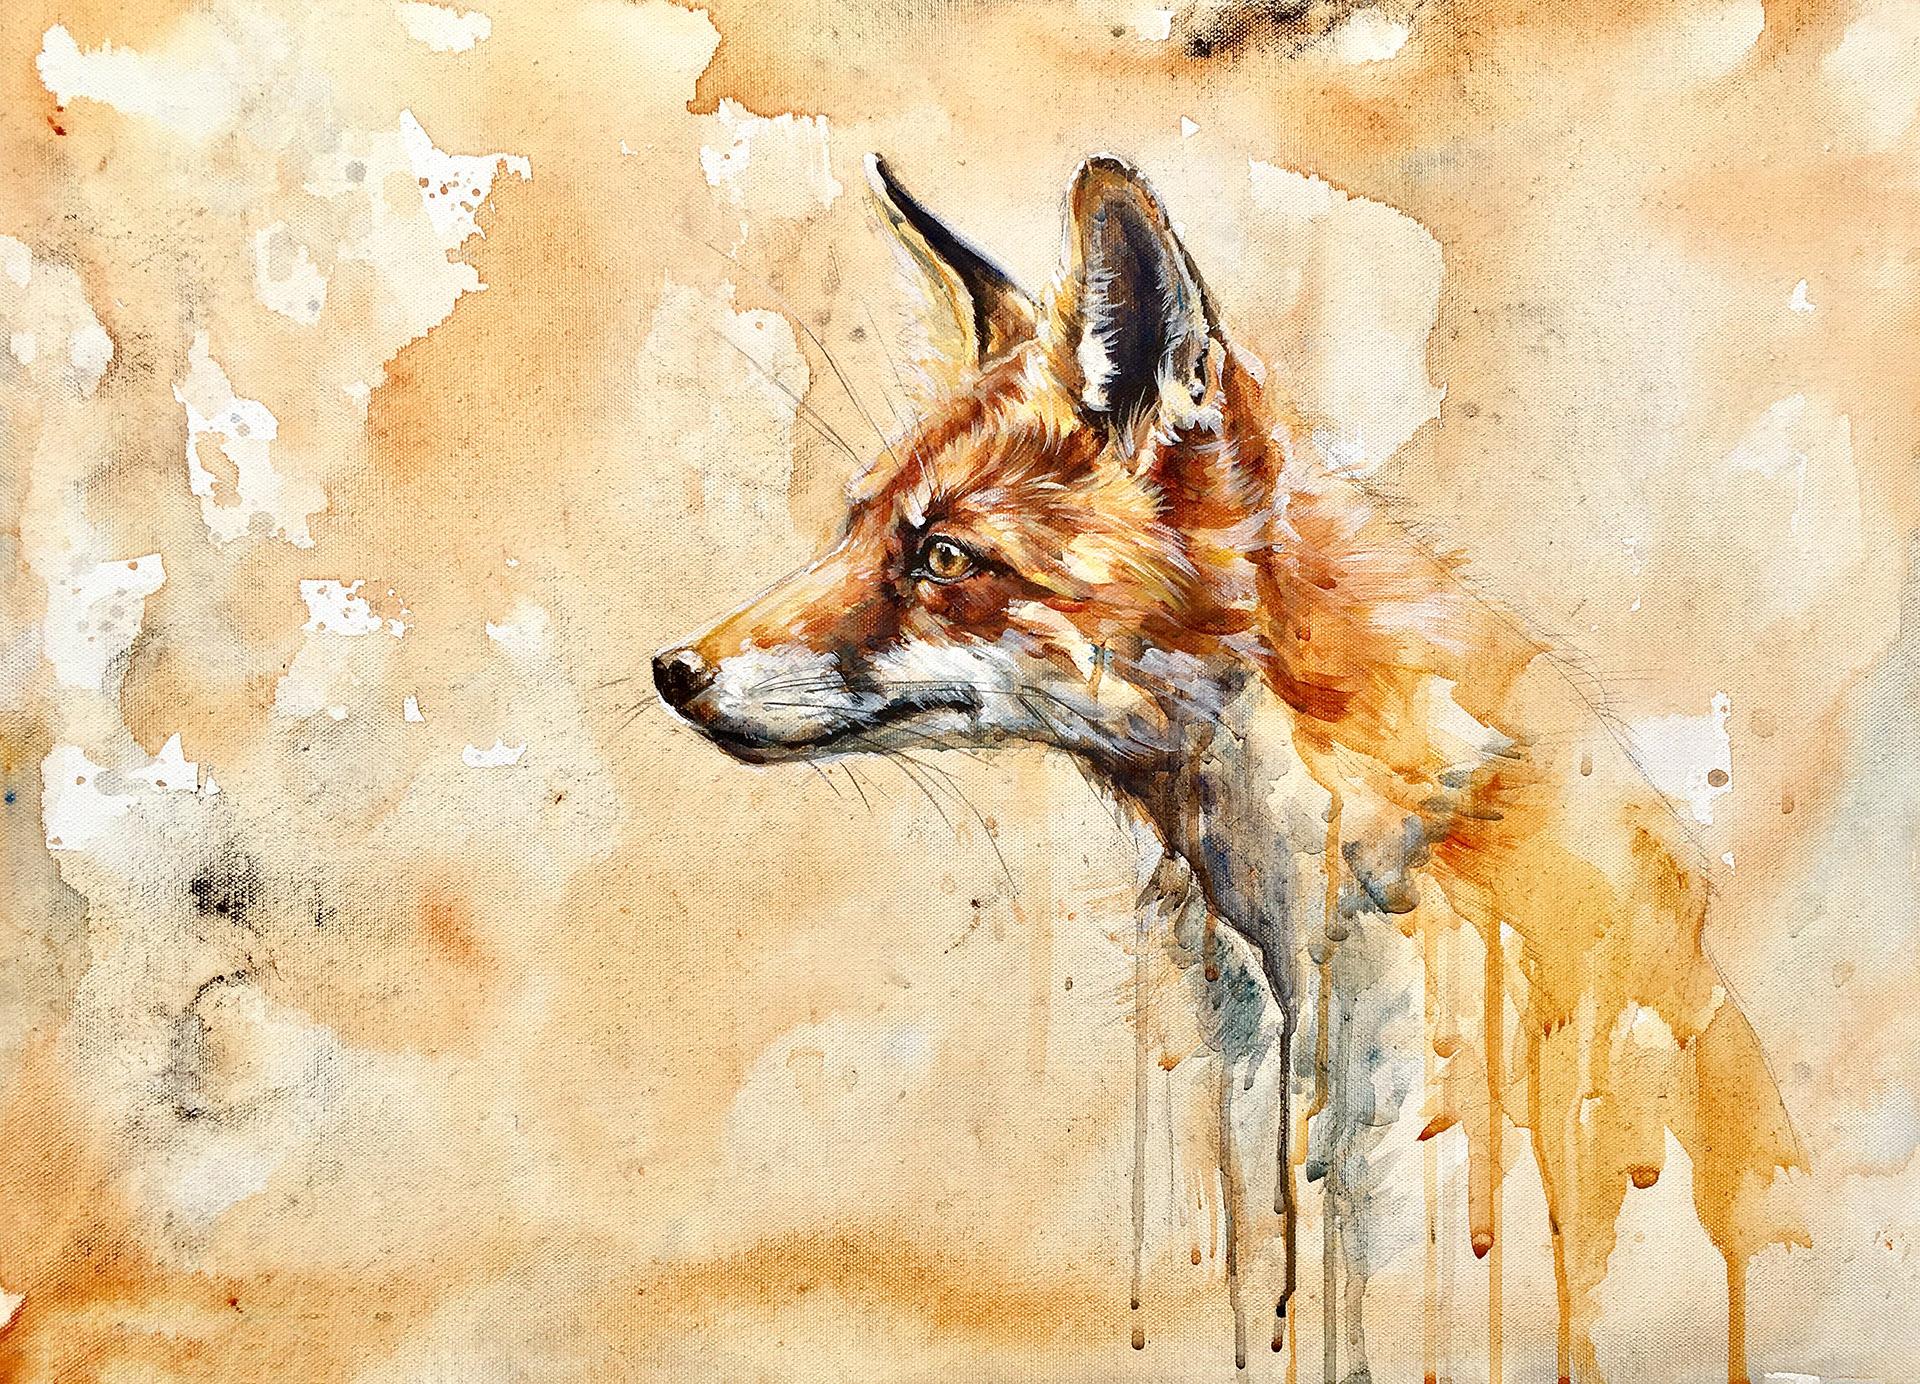 drippy-fox-jerome.jpg